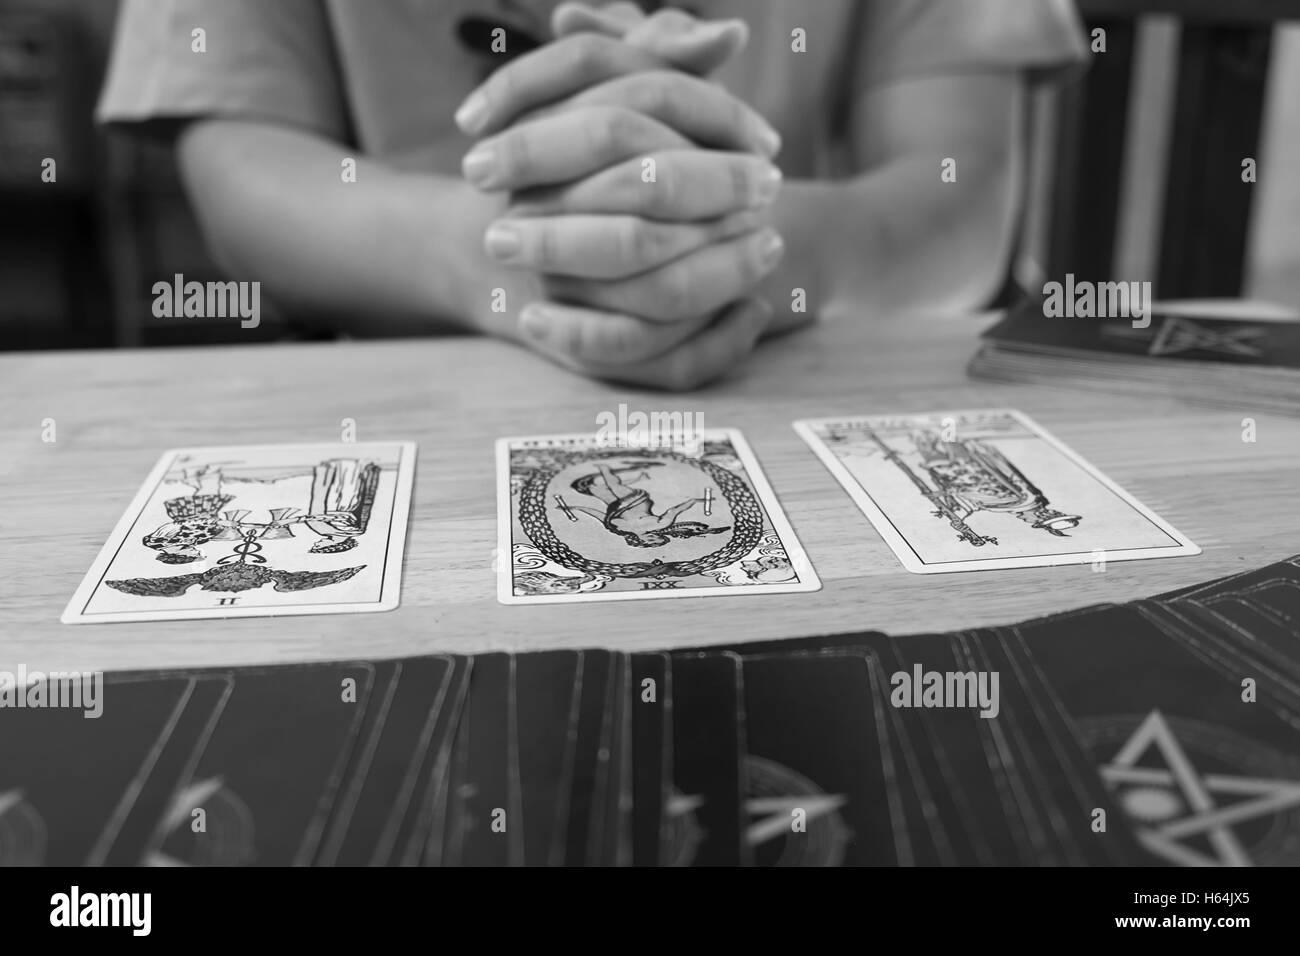 Fortune teller a tarot card monochrome effect. - Stock Image